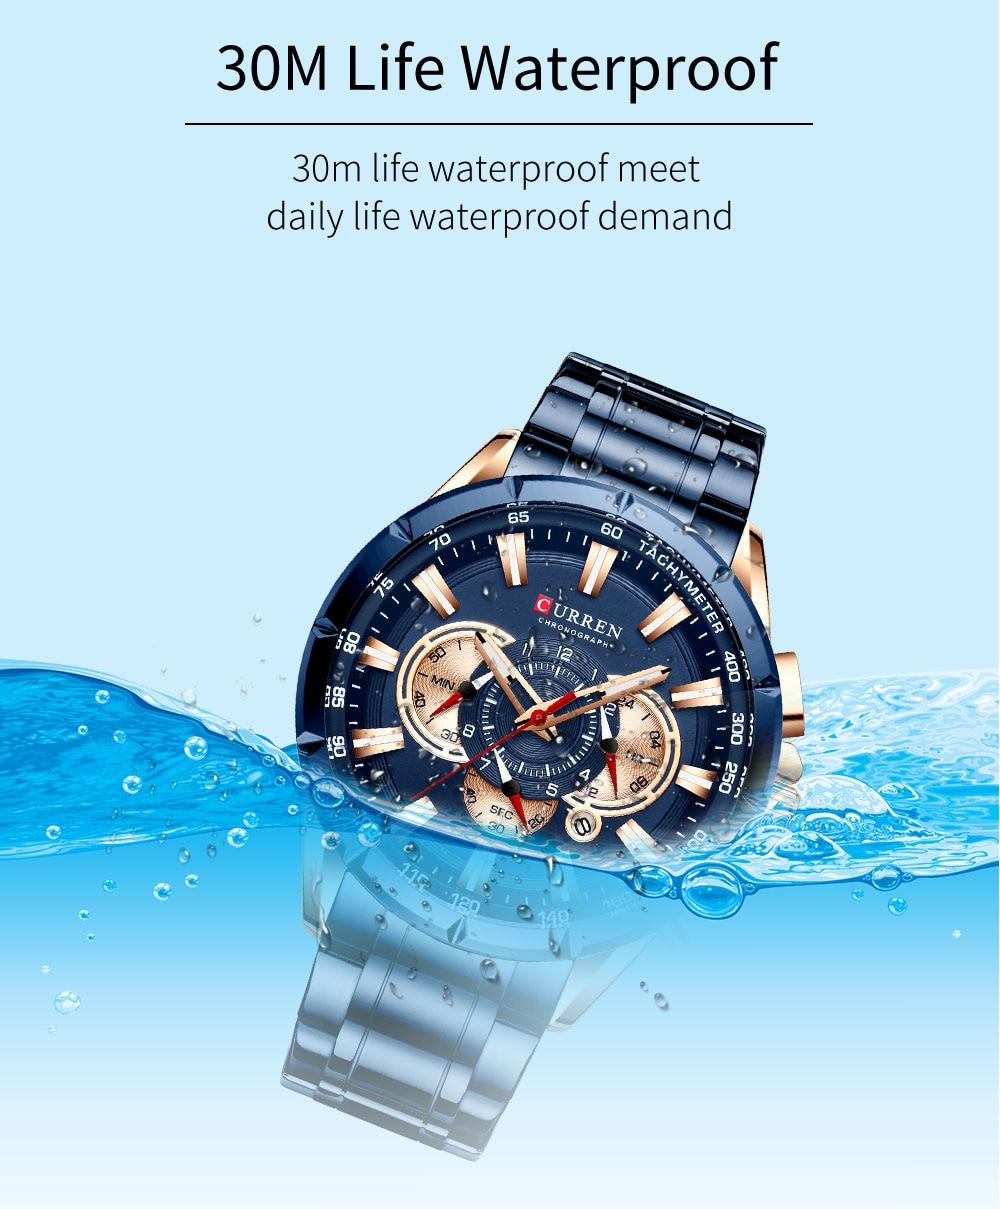 Hfa188d0687eb4e239a2cf3cd4dc53e7er CURREN New Causal Sport Chronograph Men's Watch